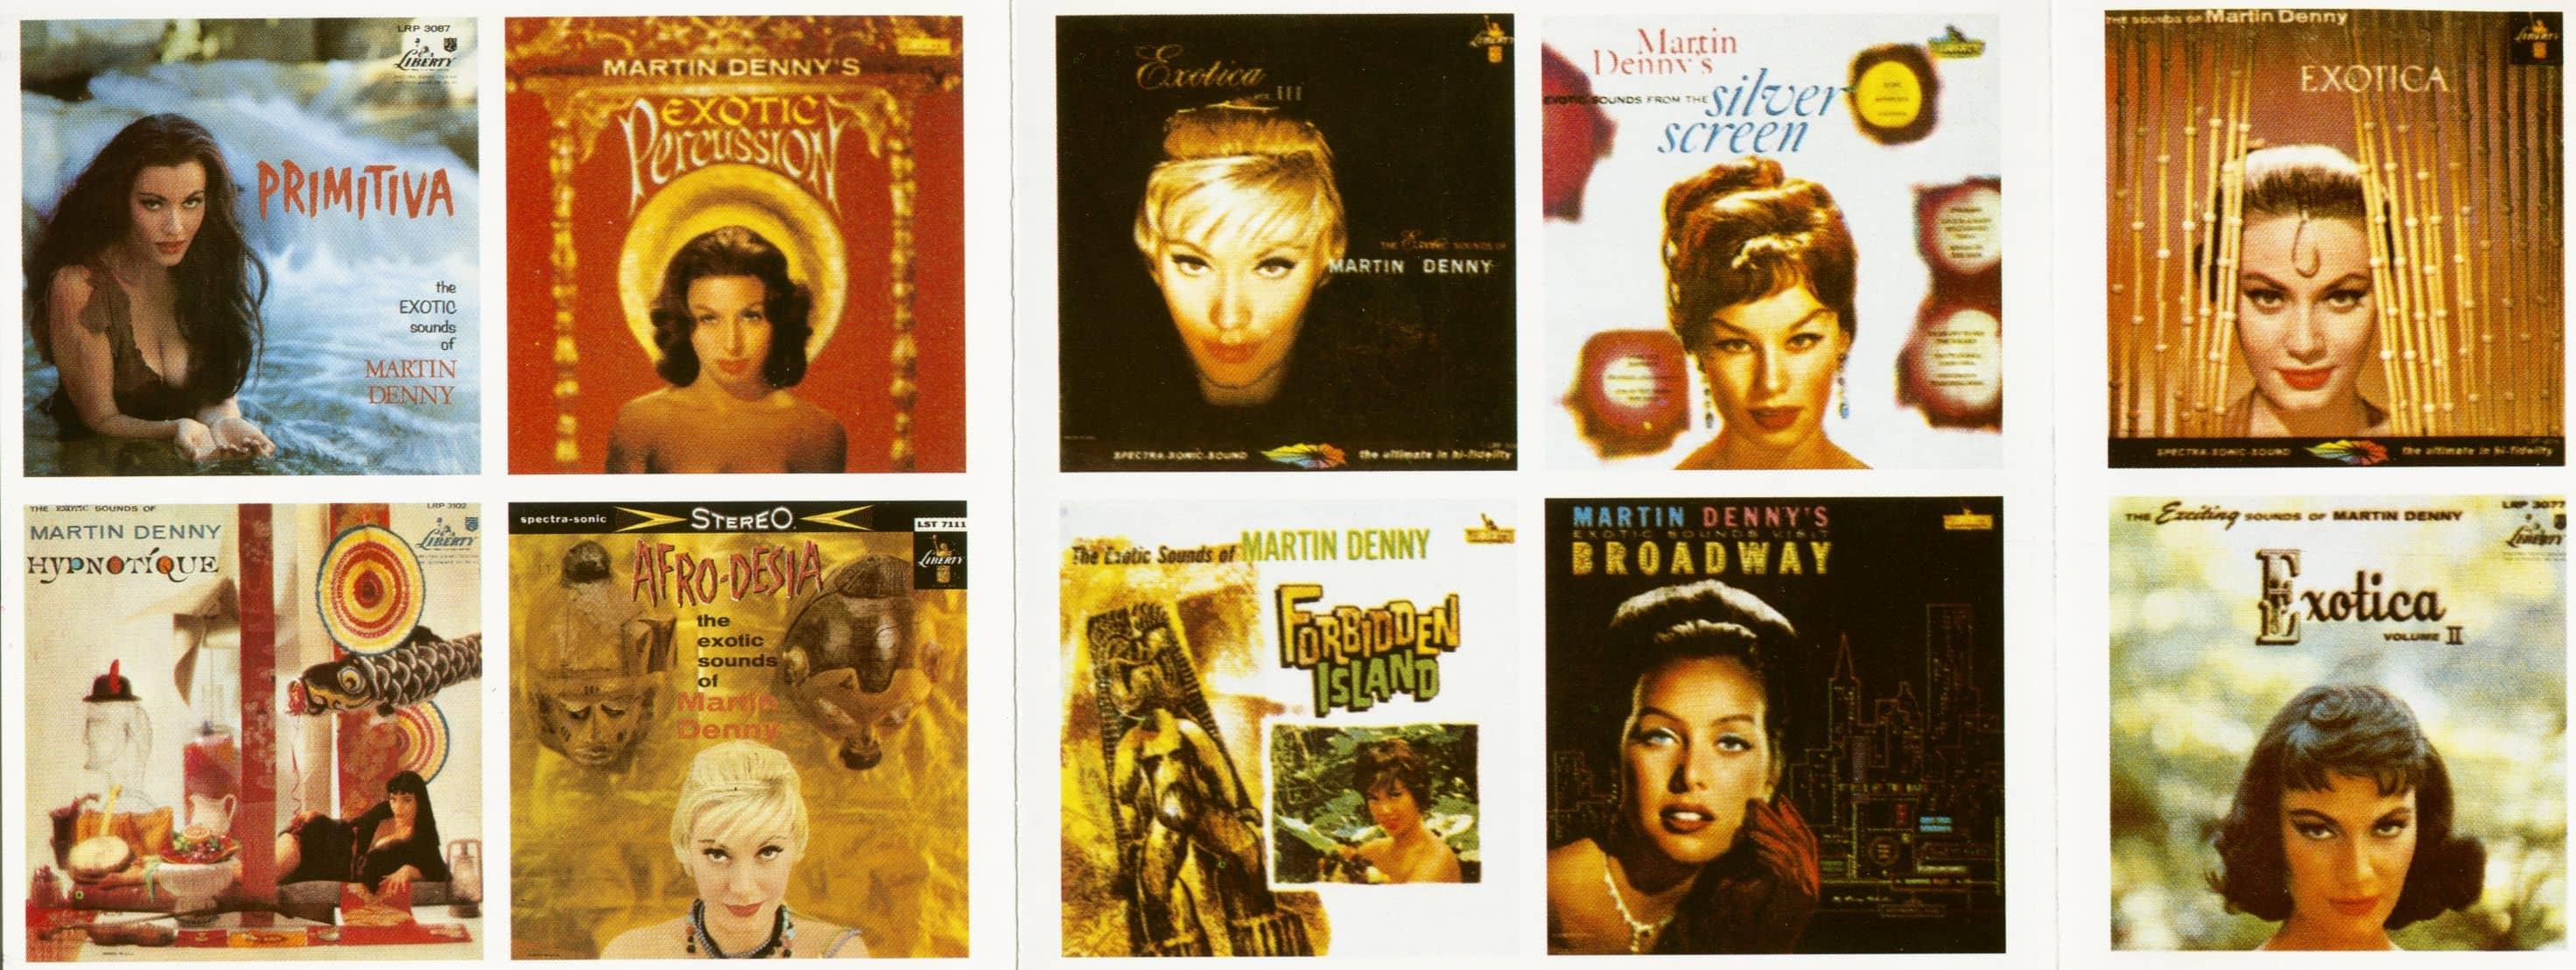 Martin Denny The Exotic Sounds Of Martin Denny (CD)